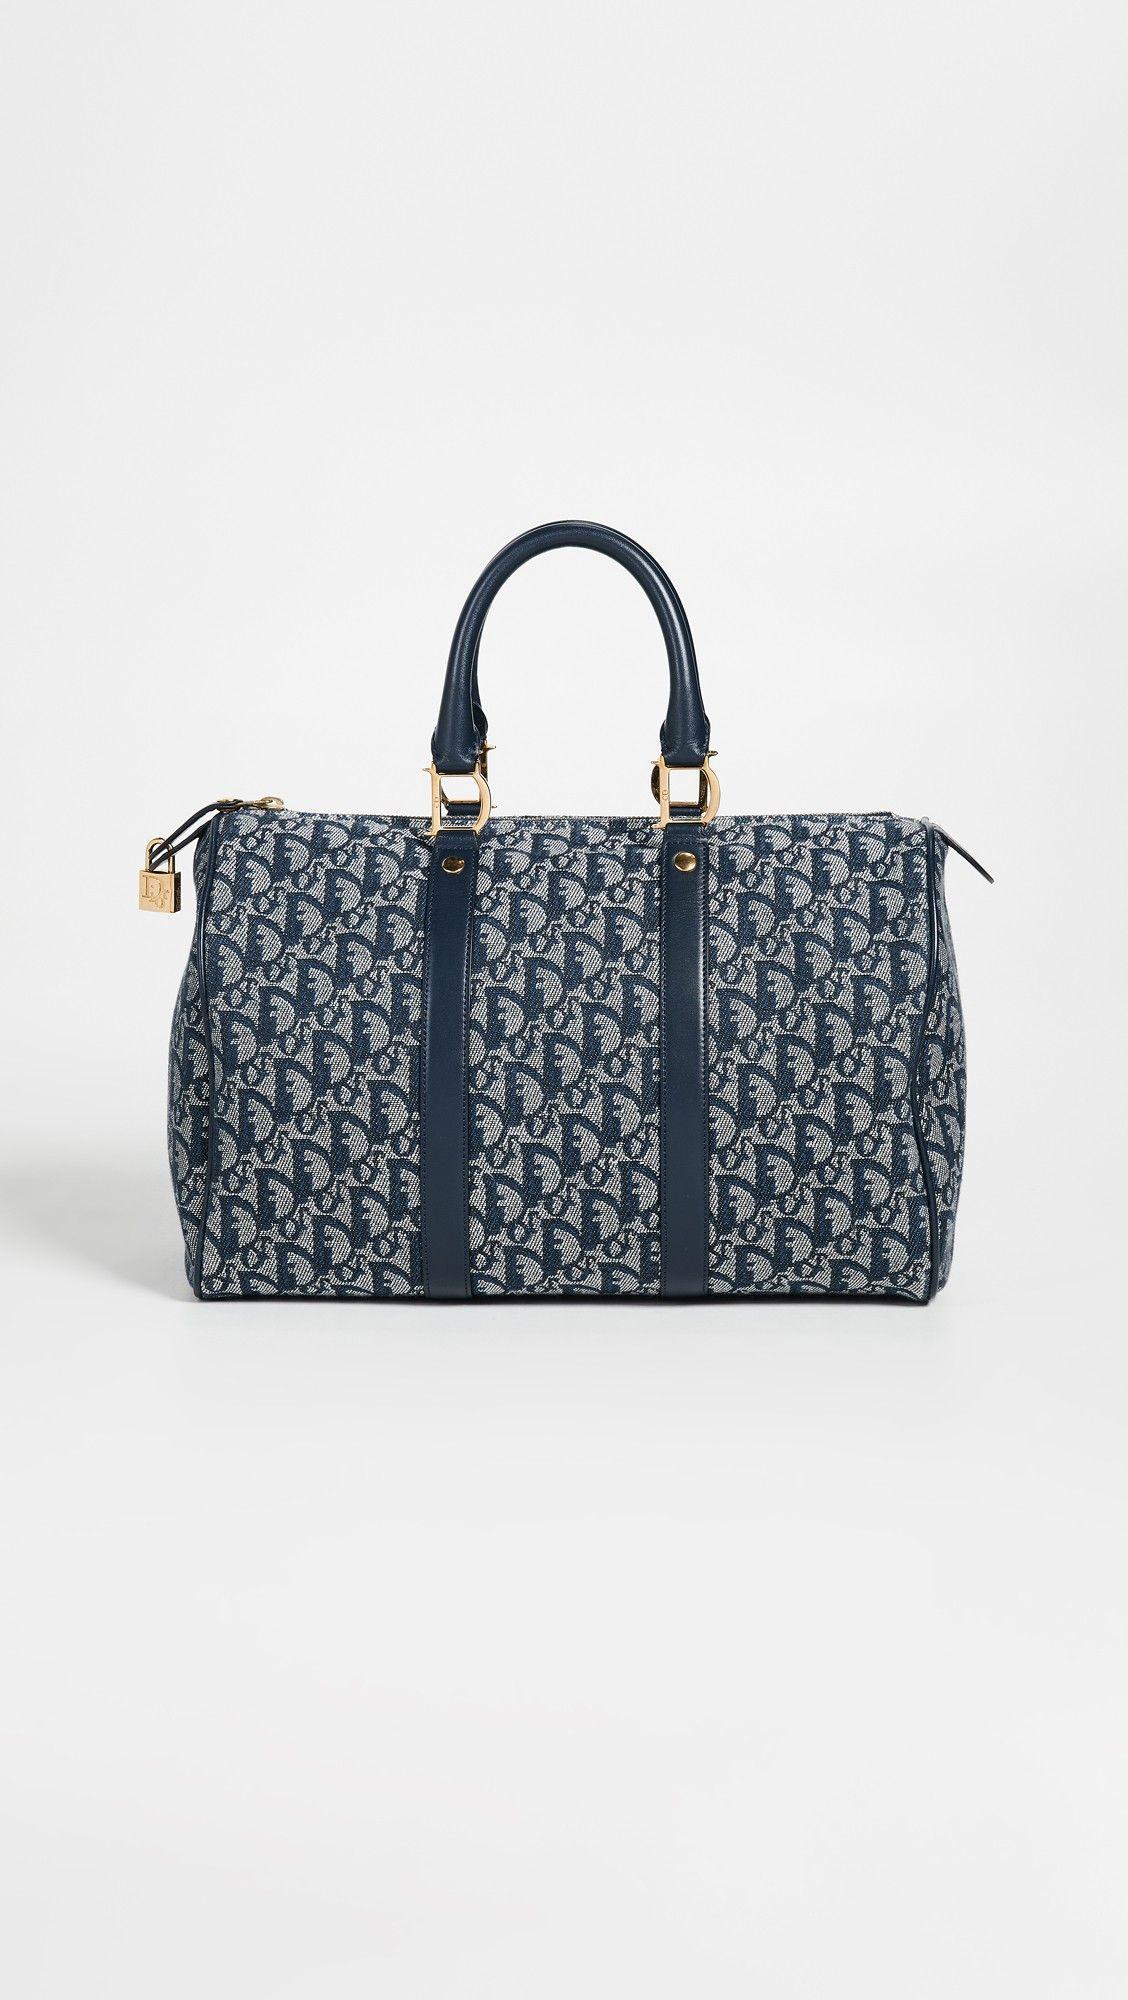 e6eff5e9ab04 What Goes Around Comes Around Dior Canvas Boston Duffel Bag